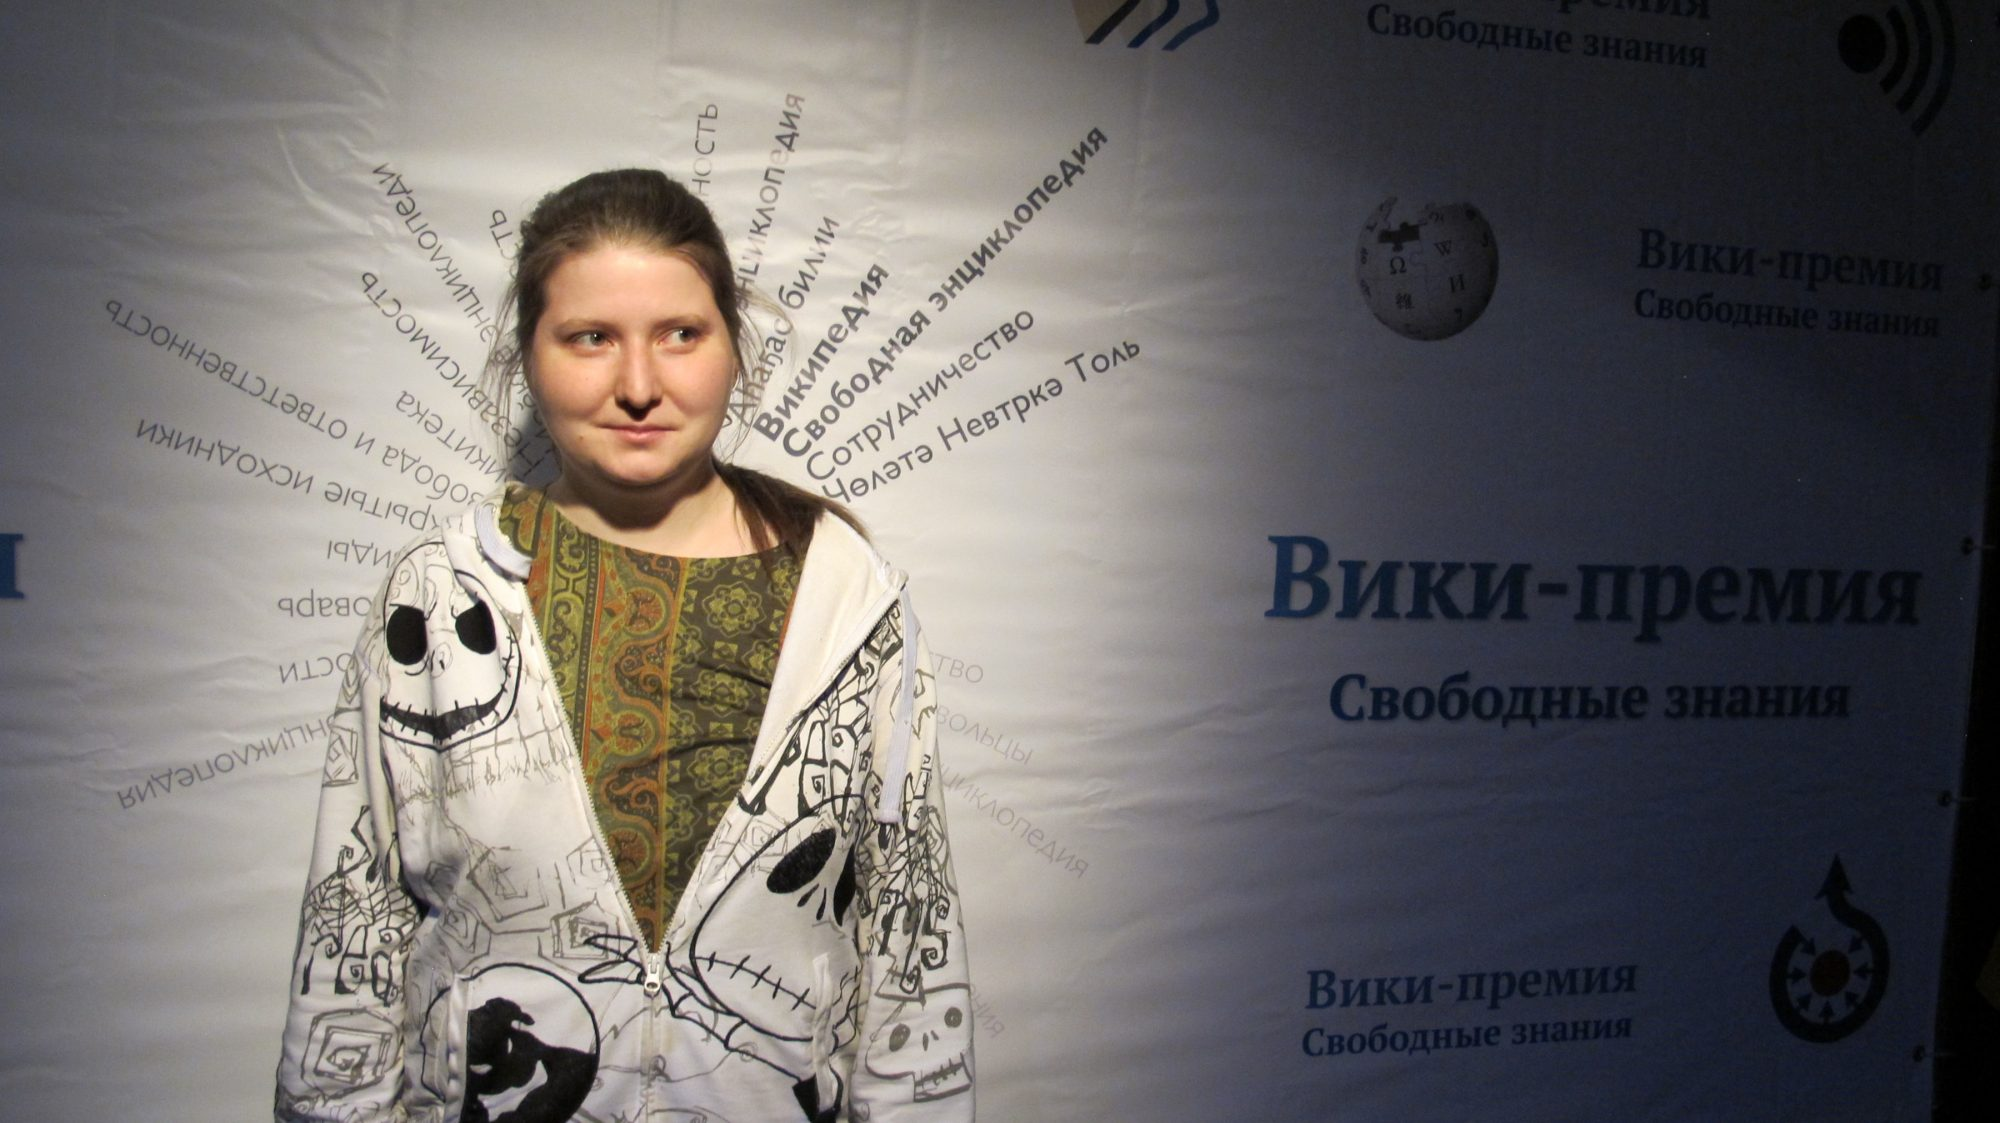 Alexandra Elbakyan